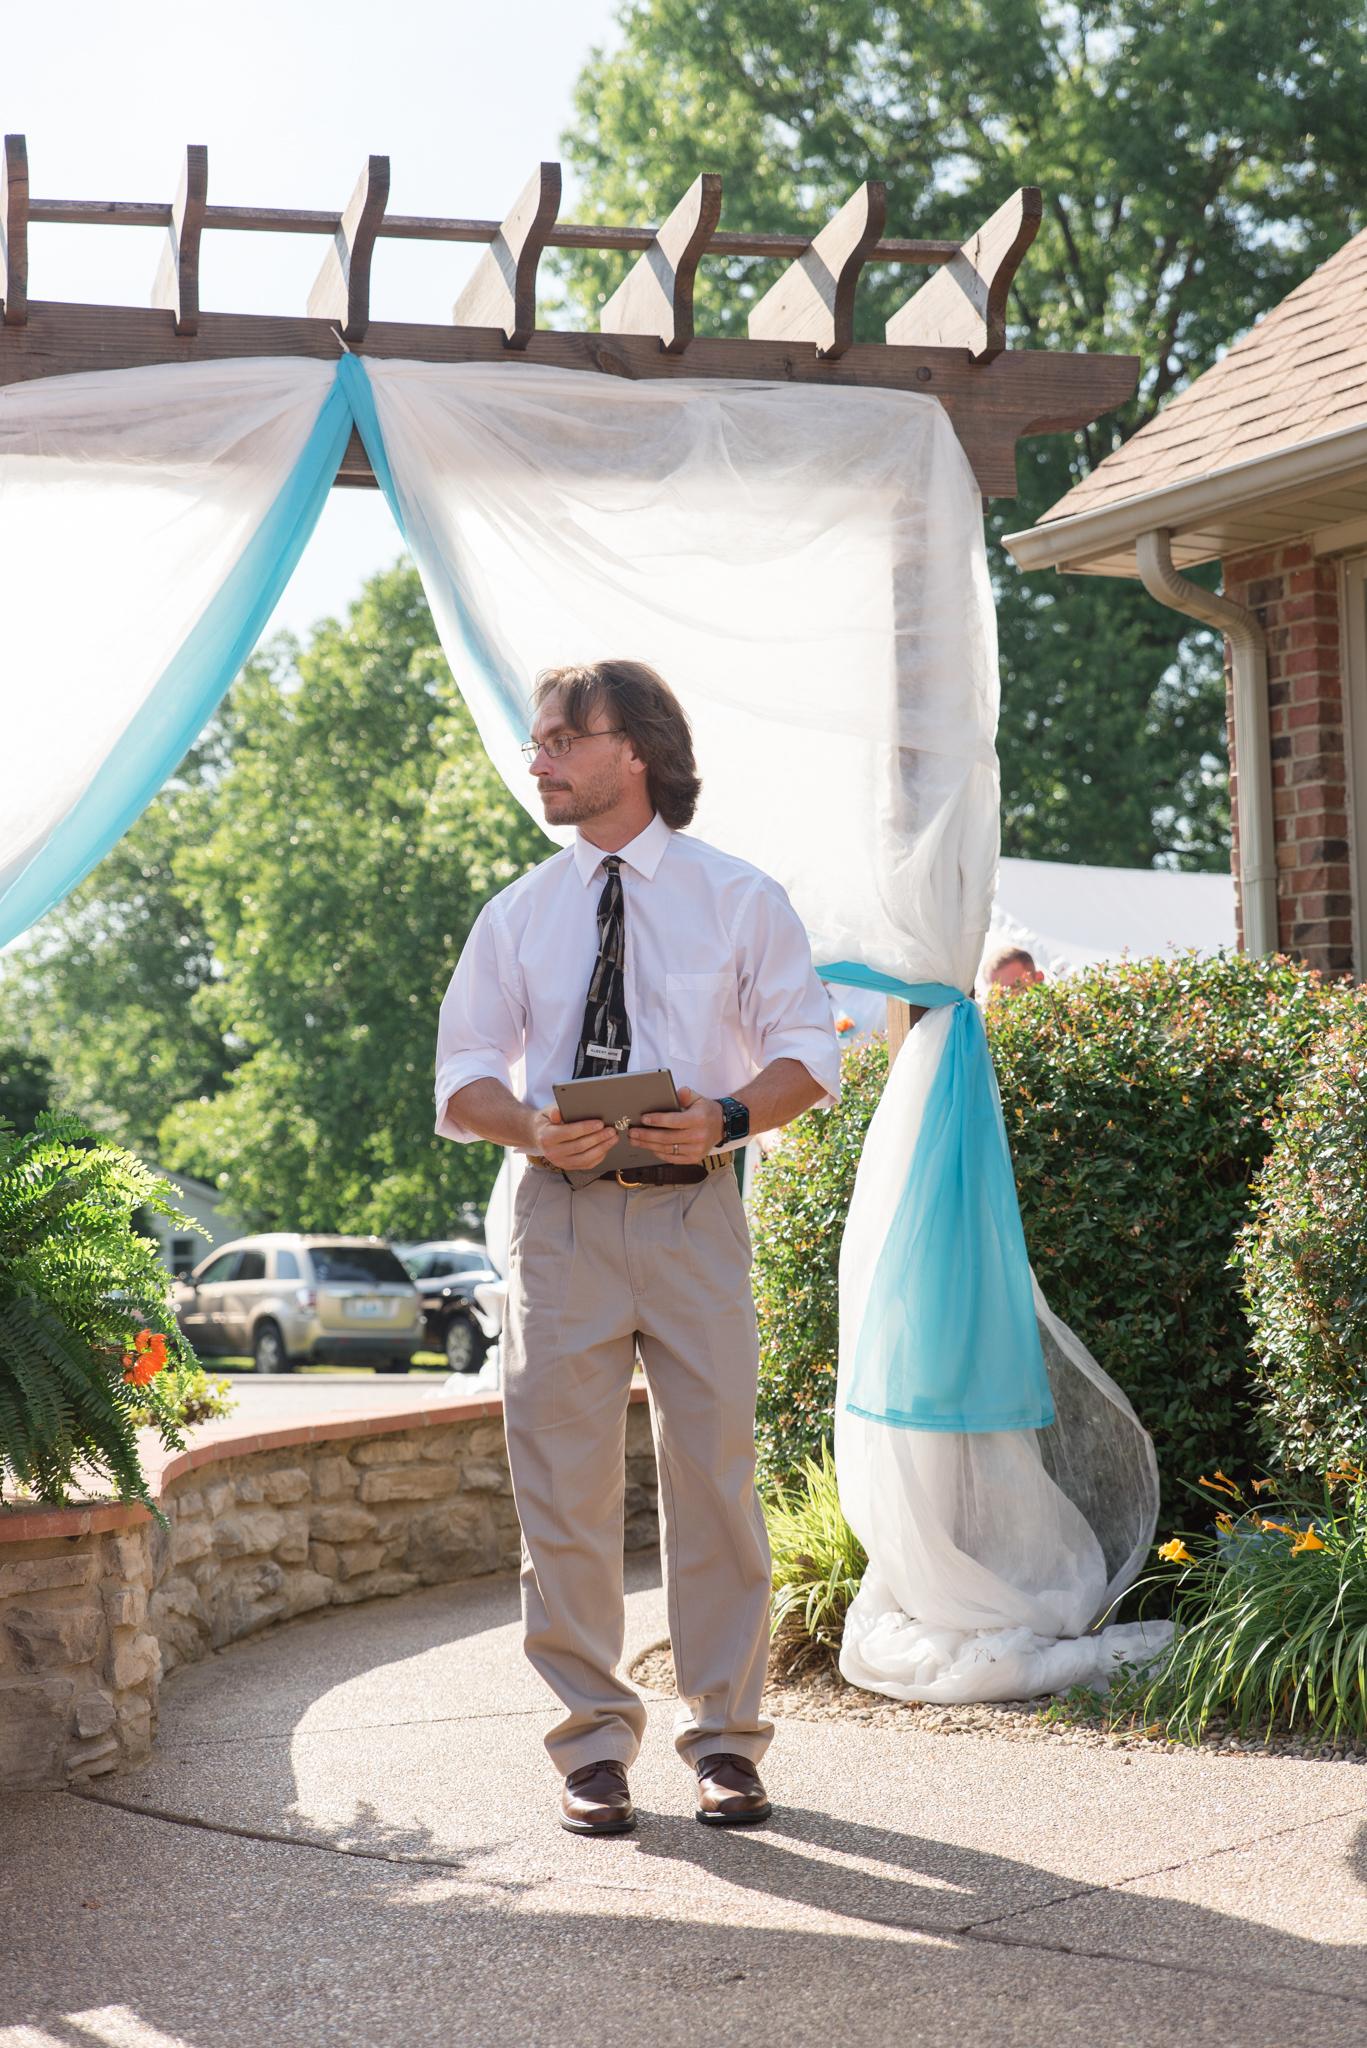 Kentucky wedding, KY wedding photographer, ky bride, Winchester KY, Winchester KY wedding photographer